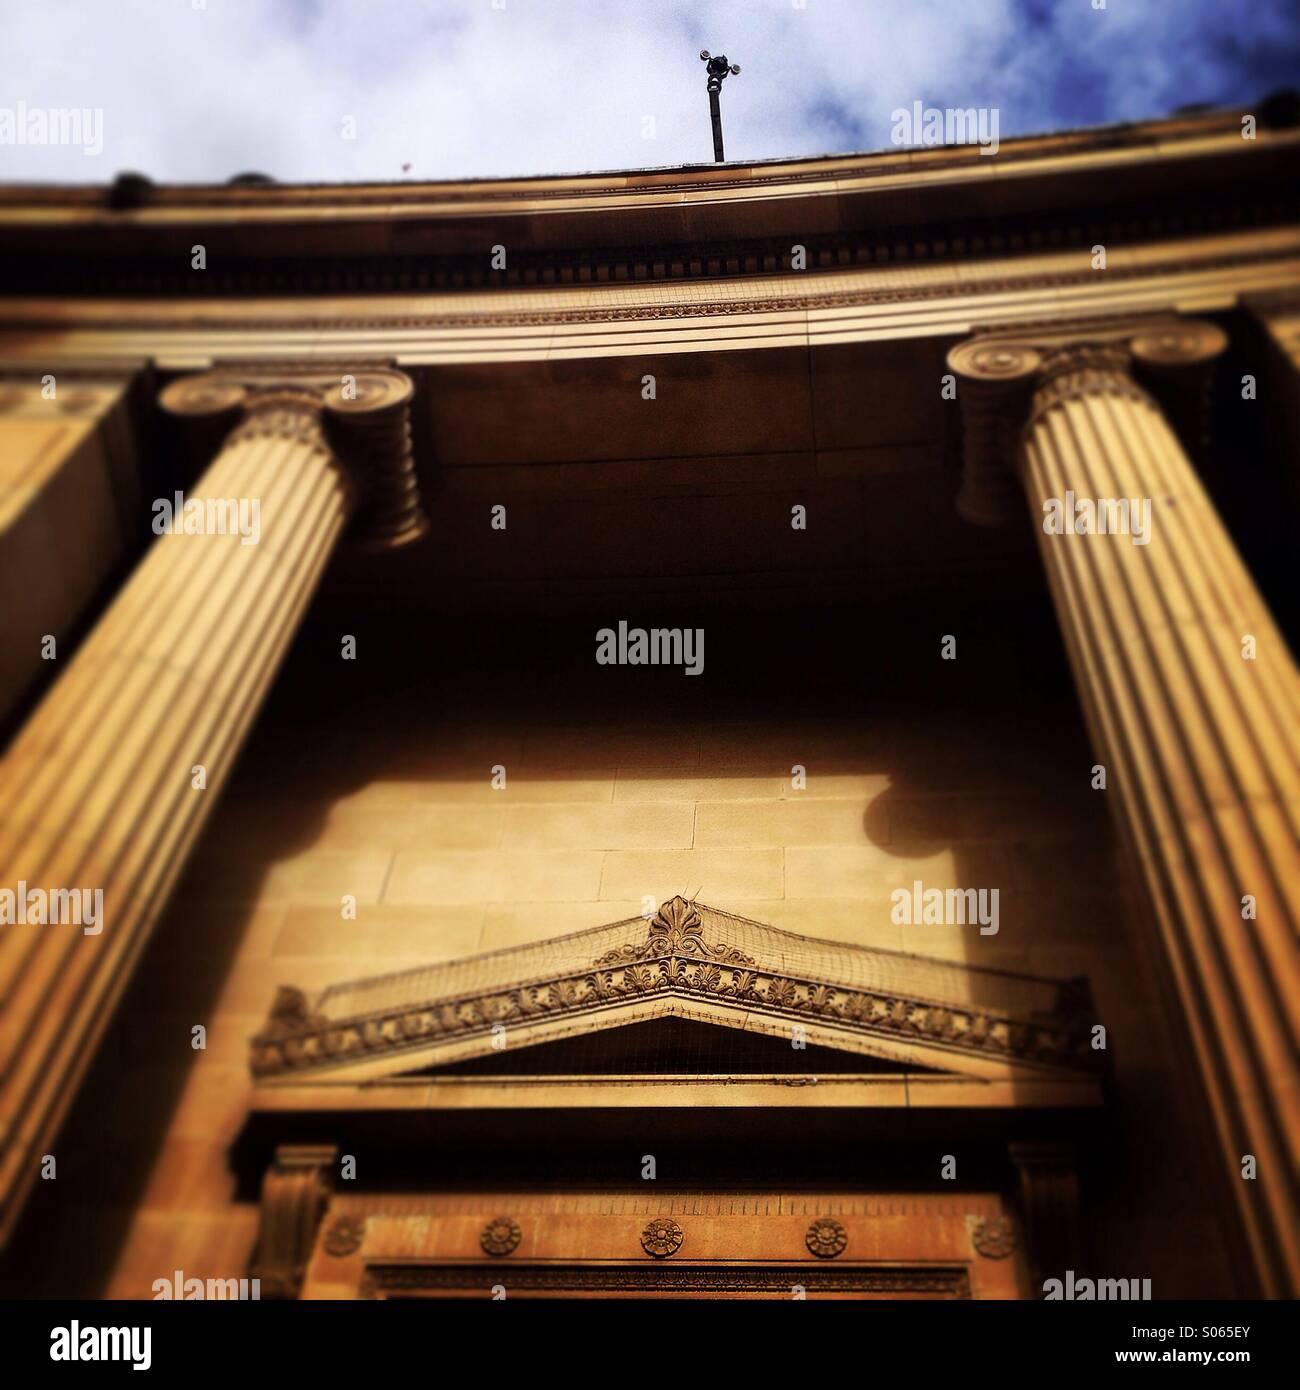 Pillars of power - Stock Image